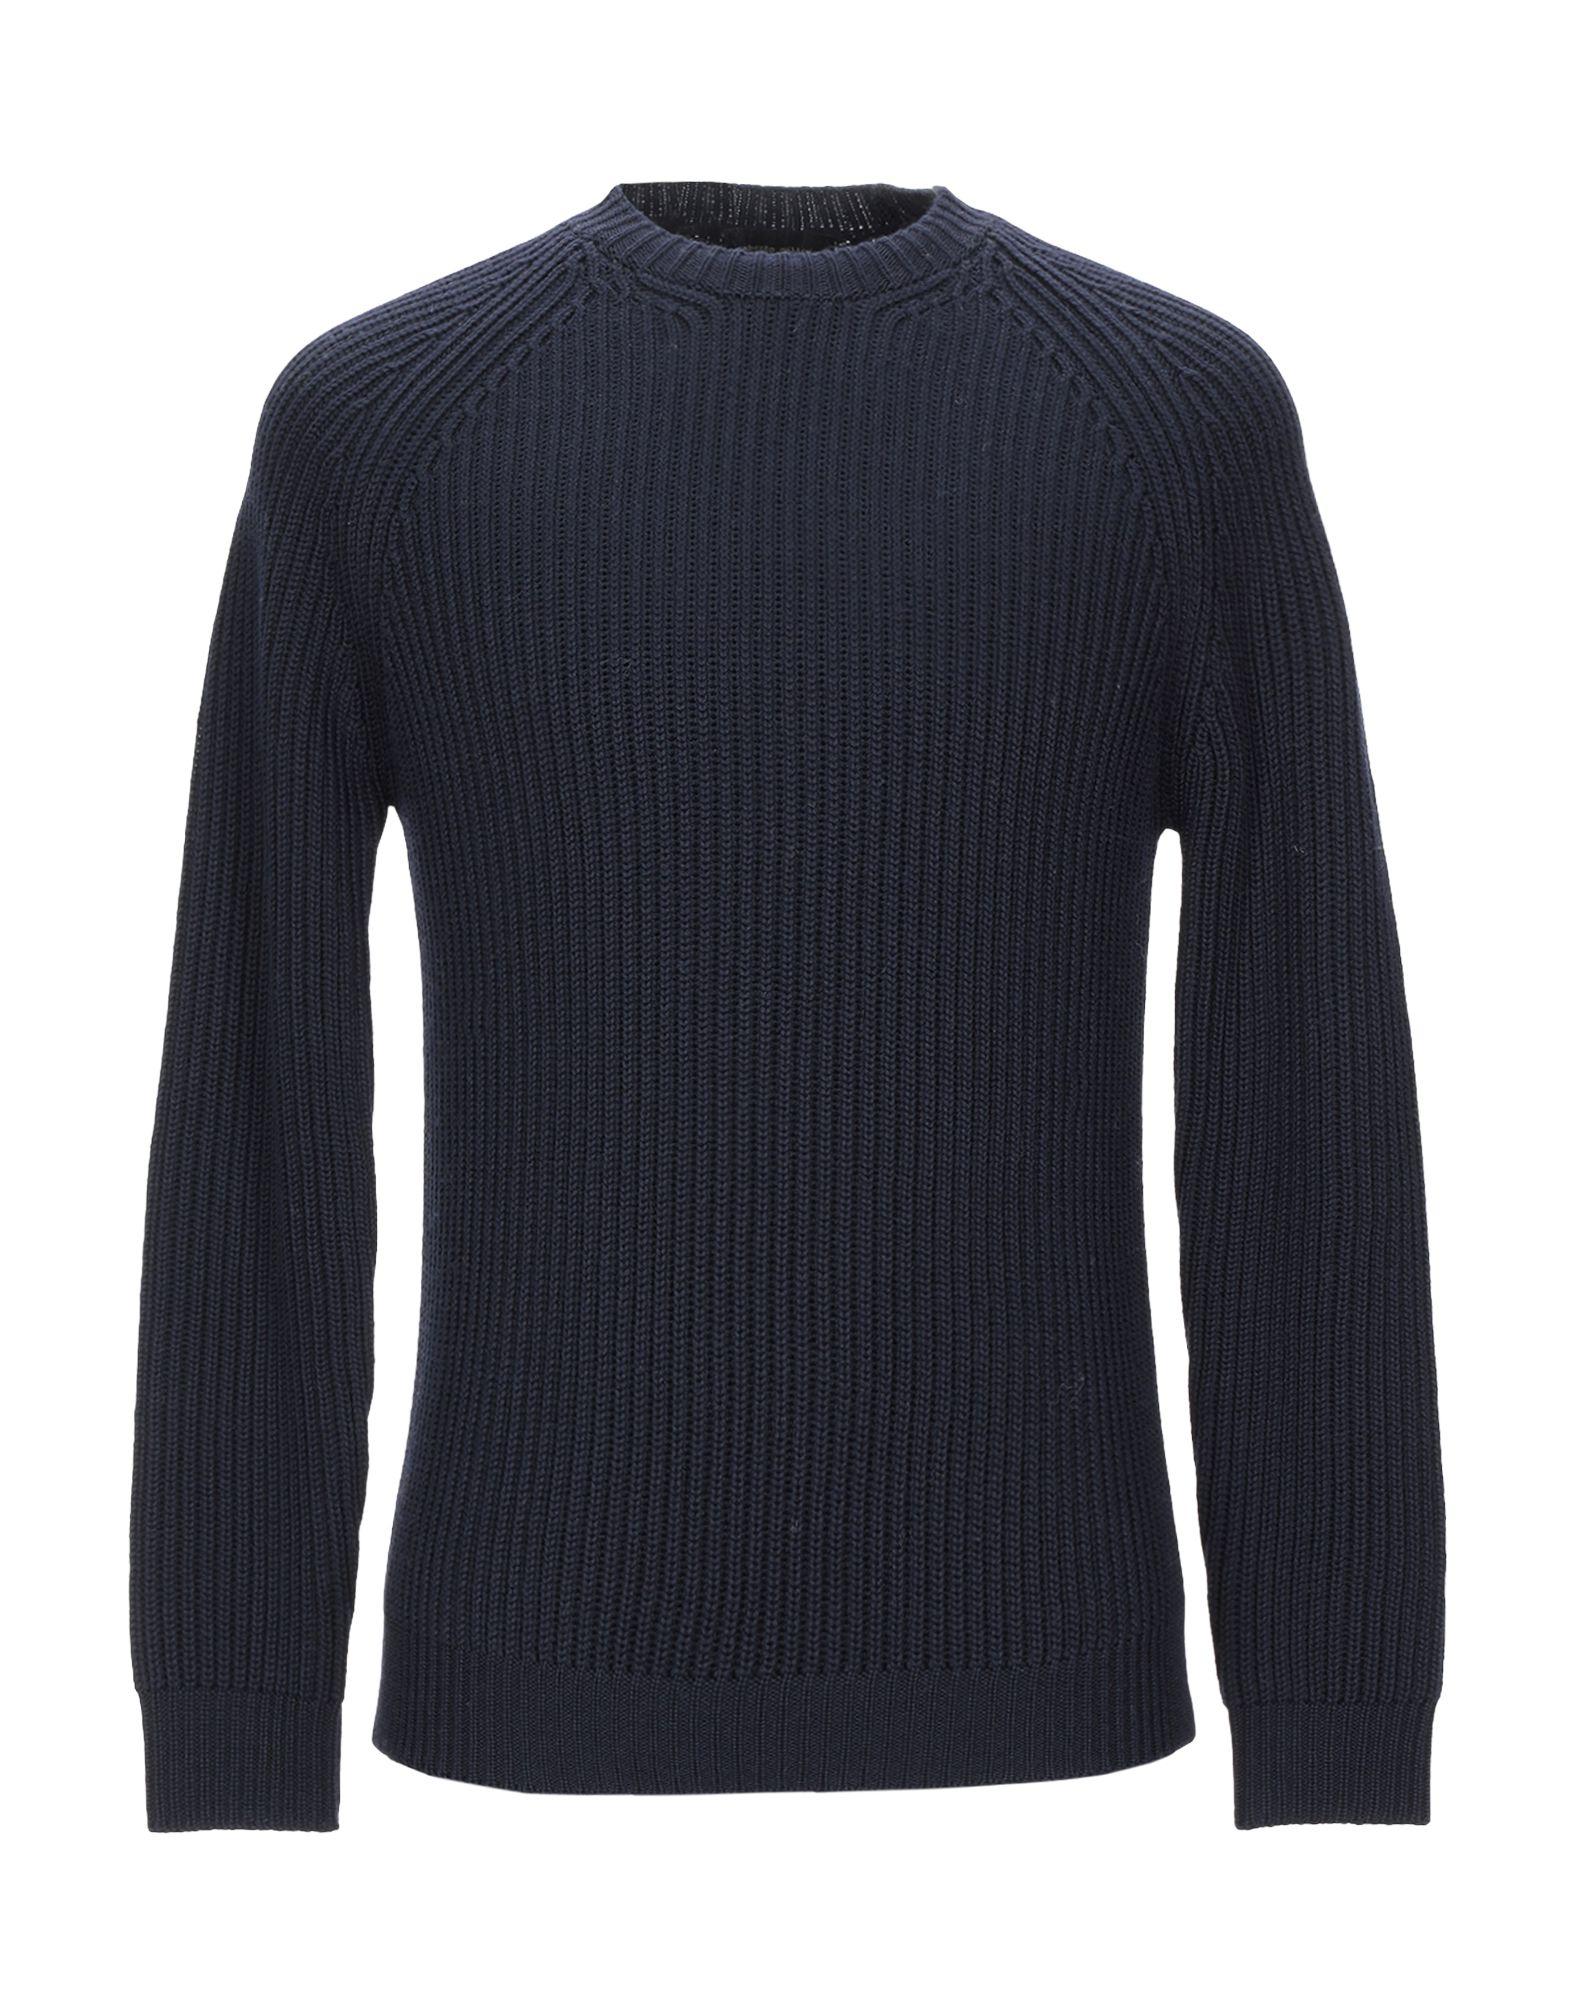 Qiangjinjiu Mens Sweaters Casual Pullover Crew Neck Long Sleeve Cable Knit Sweater Tops